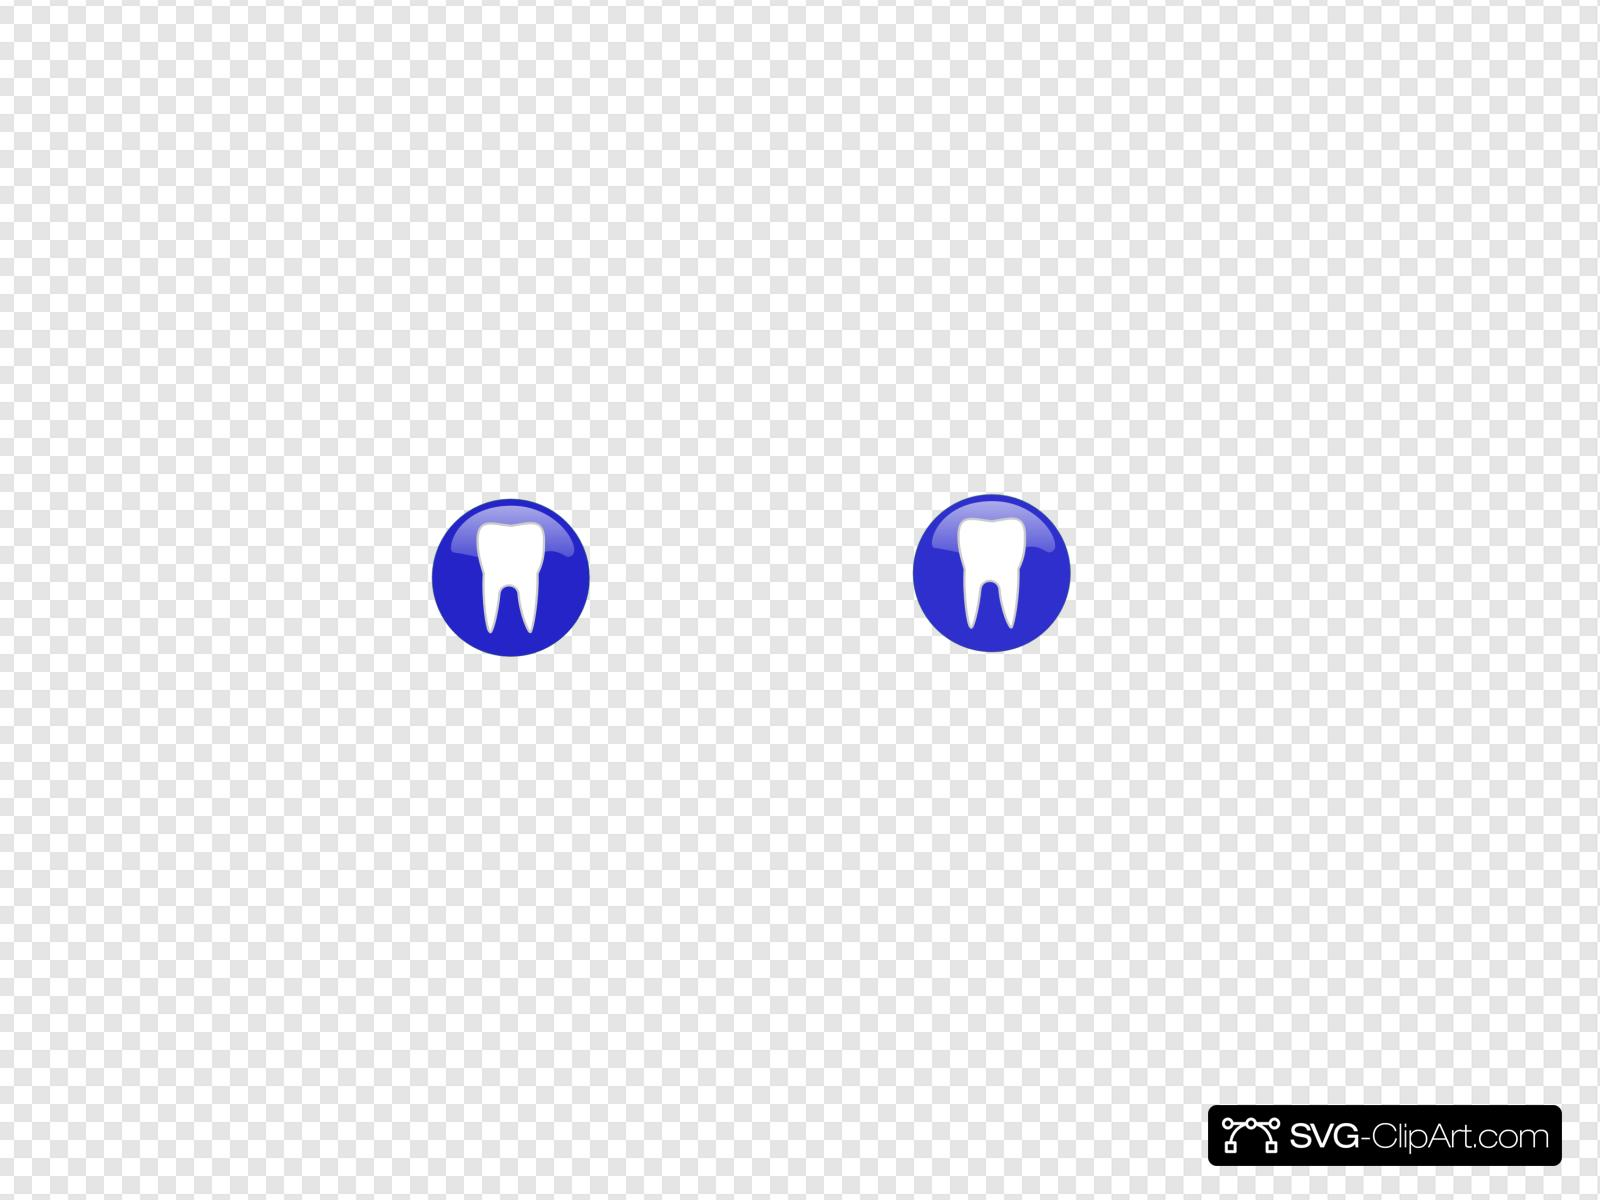 Dentistbd Logo Clip art, Icon and SVG.